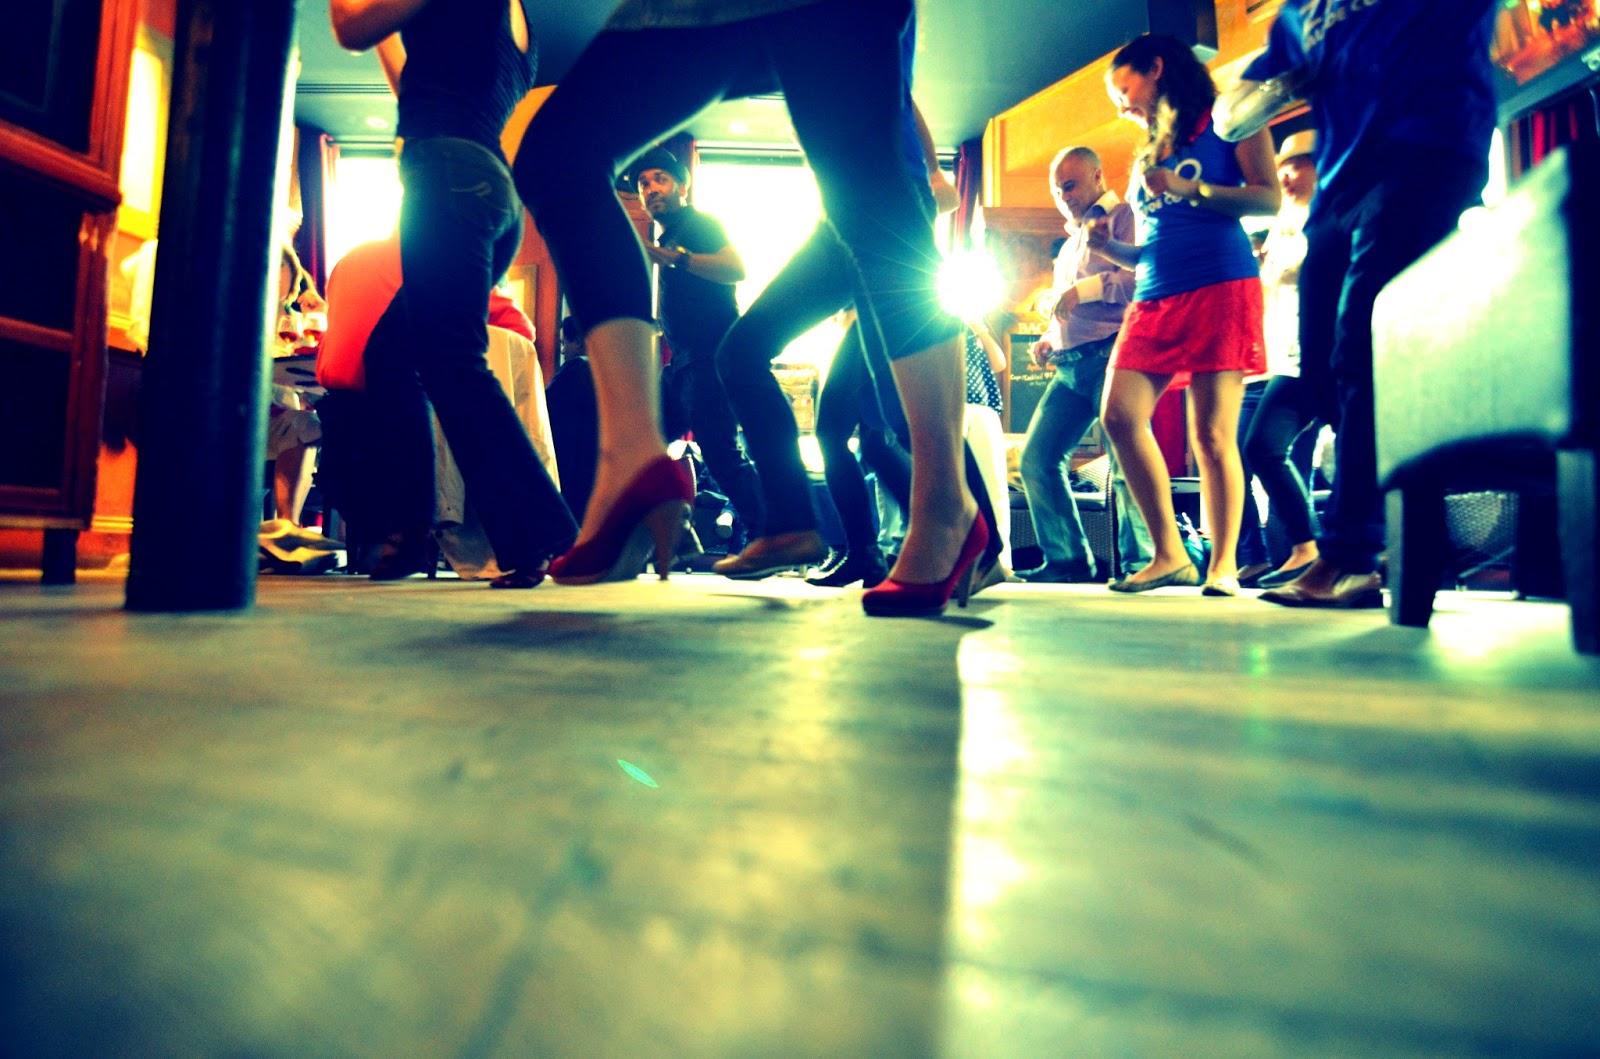 dancing-salsa.jpg